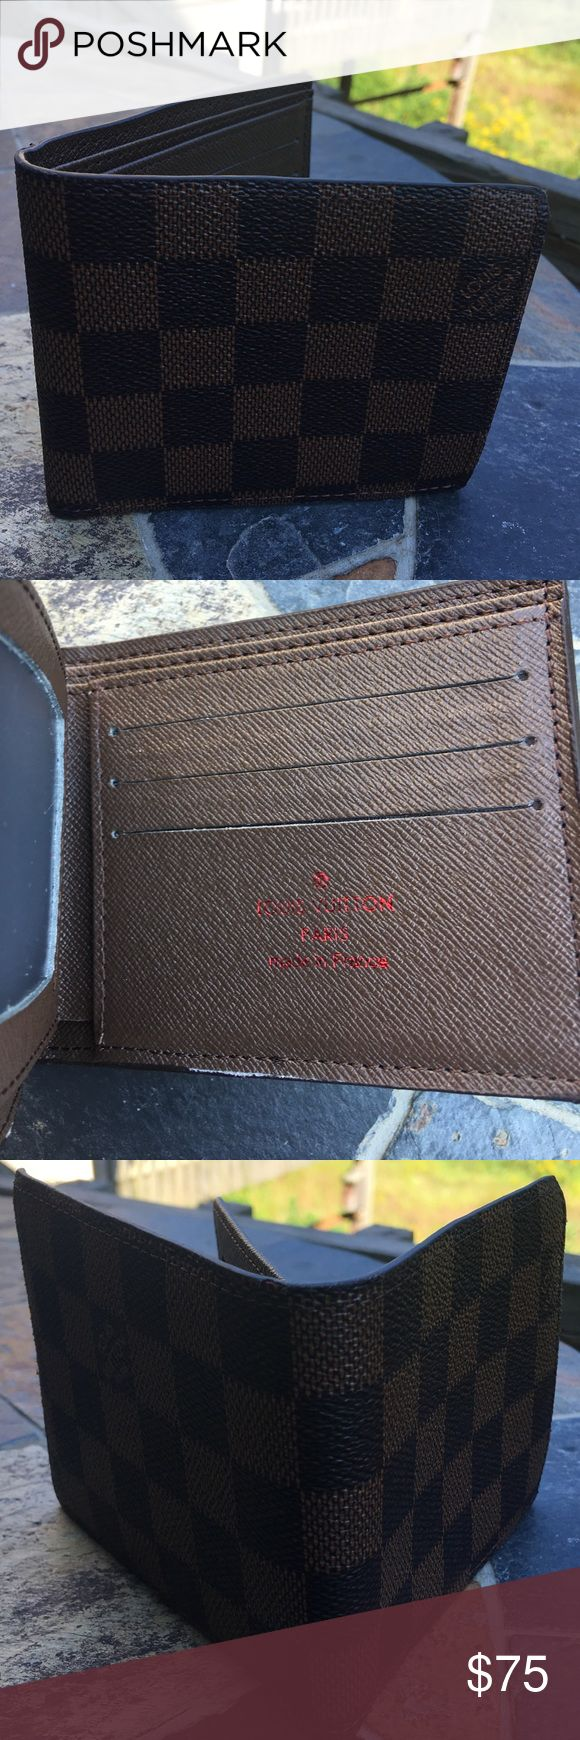 LOUIS VUITTON WALLET Price reflects a brand new Louis Vuitton wallet. UA, No Flaws. OBO. No Lowballing Louis Vuitton Accessories